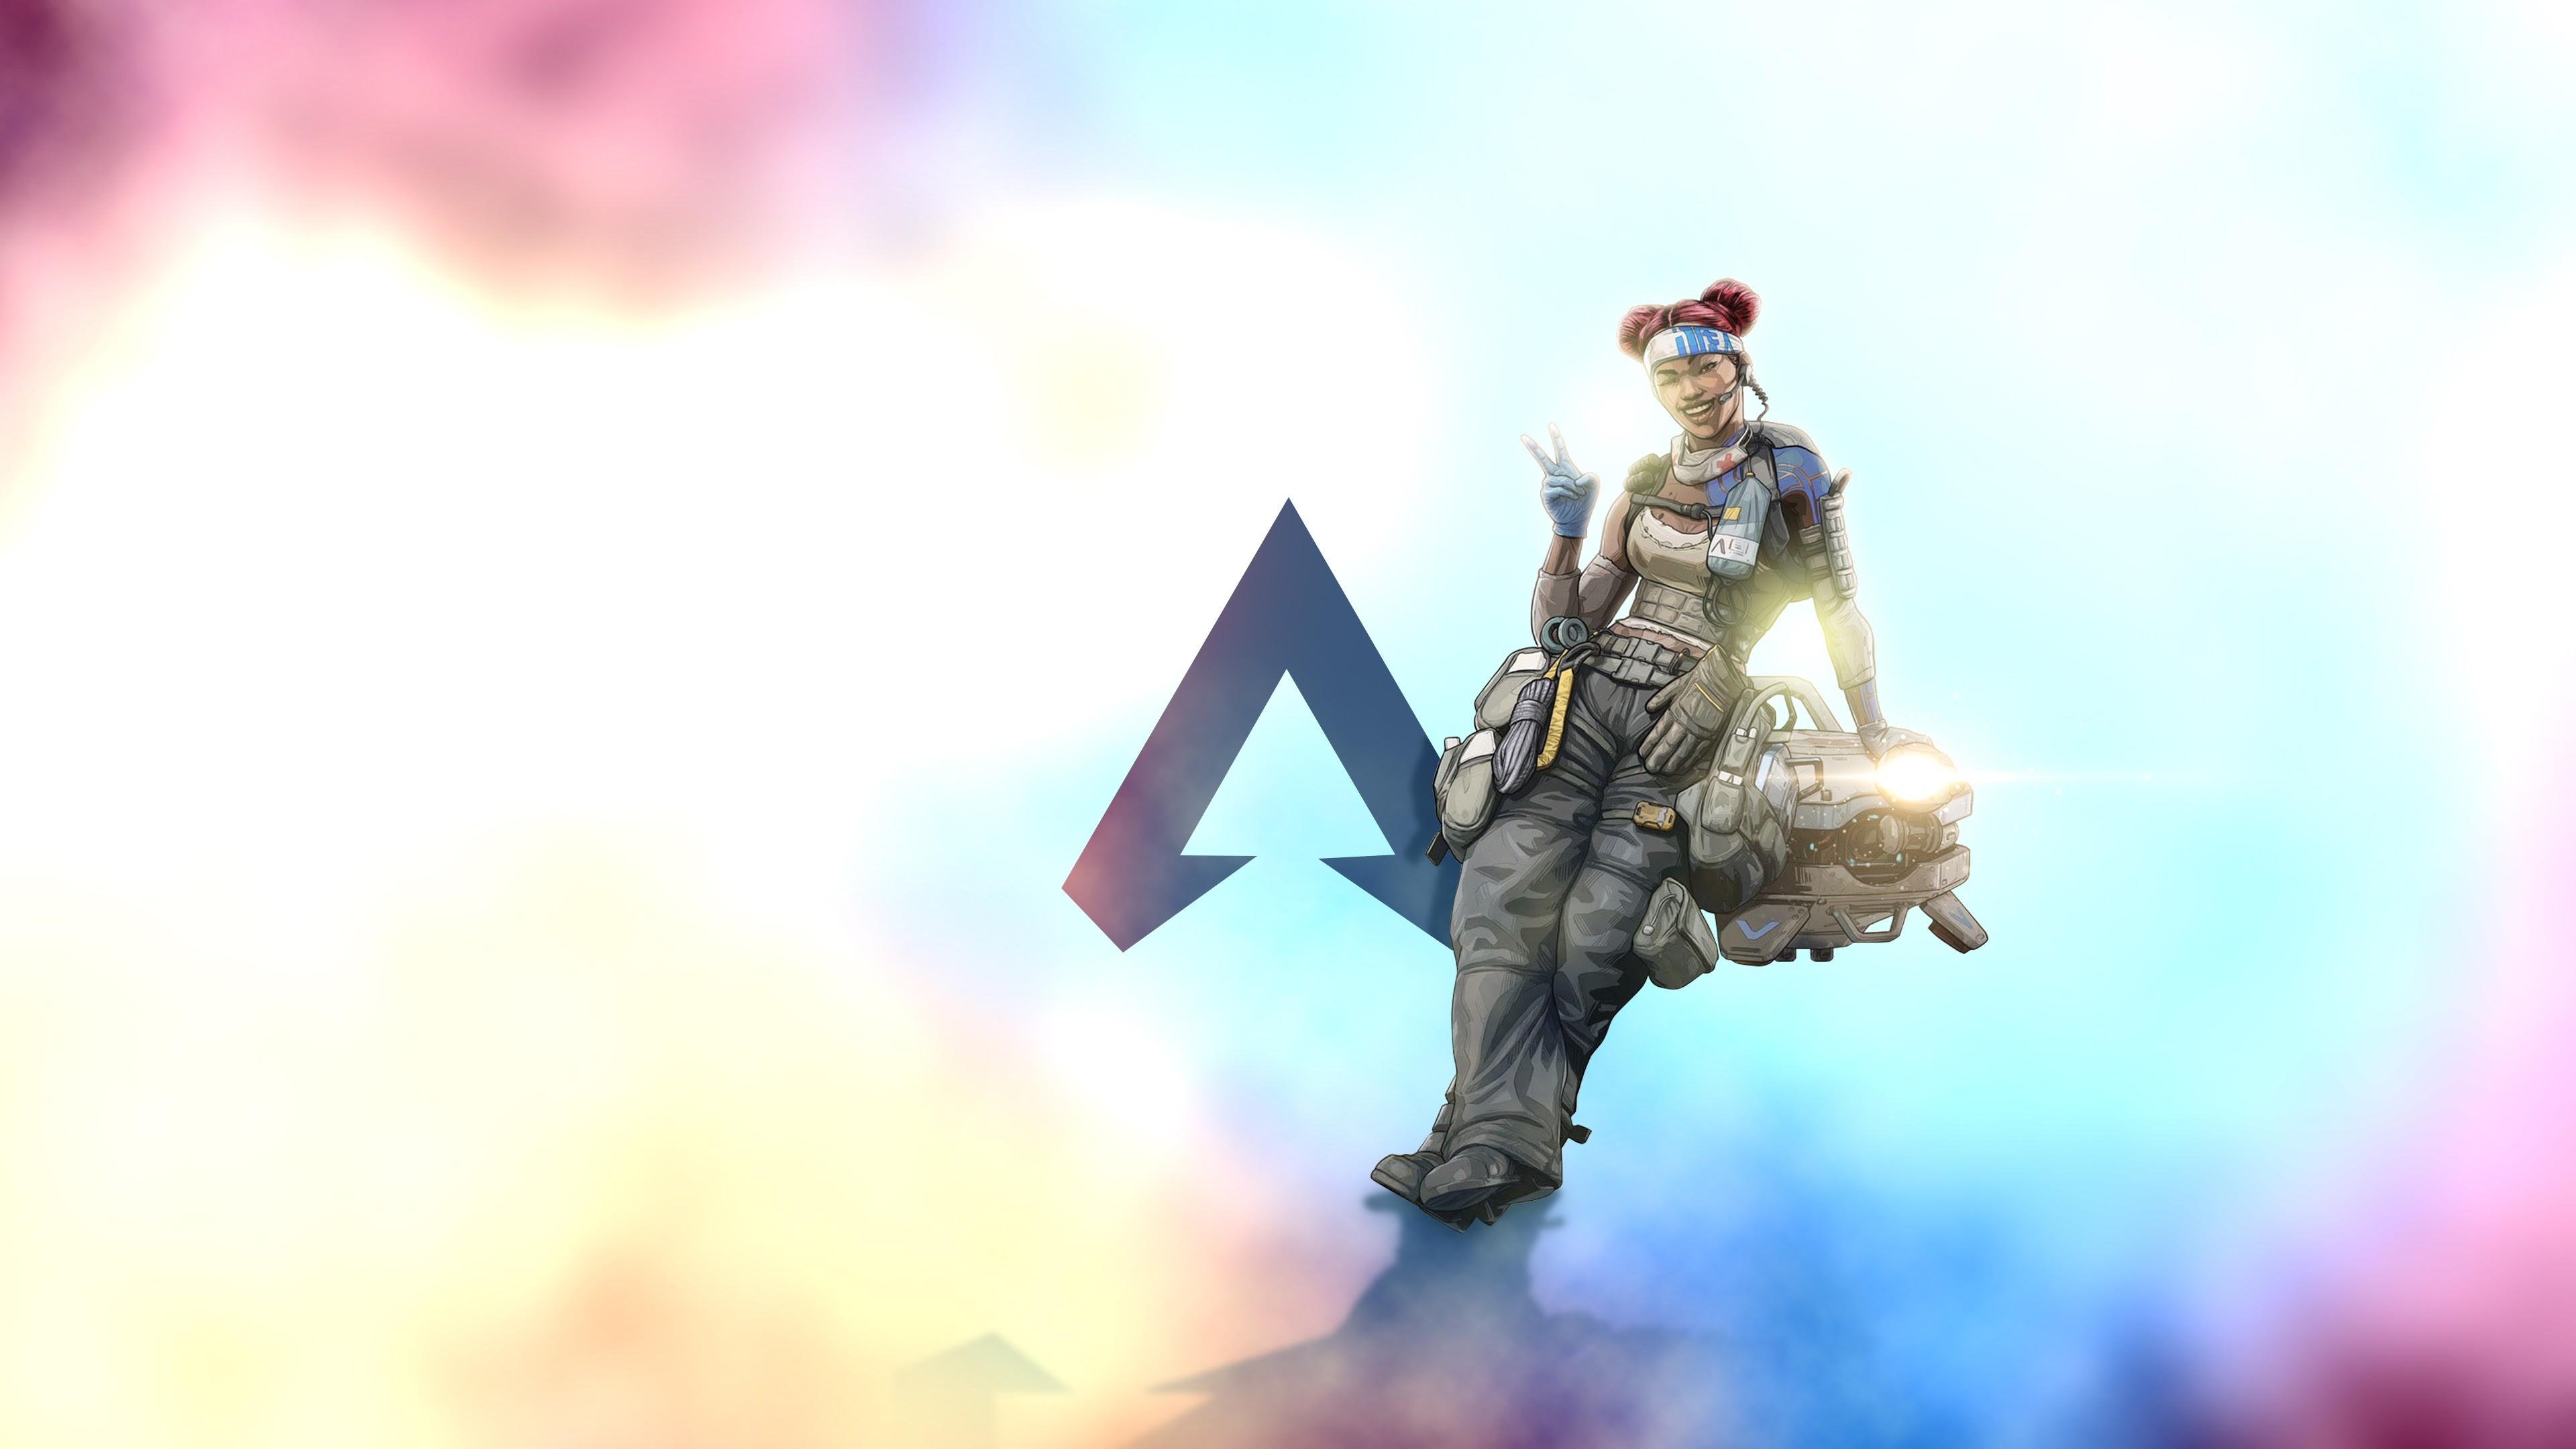 Apex Legends, Lifeline, 4K, #100 Wallpaper